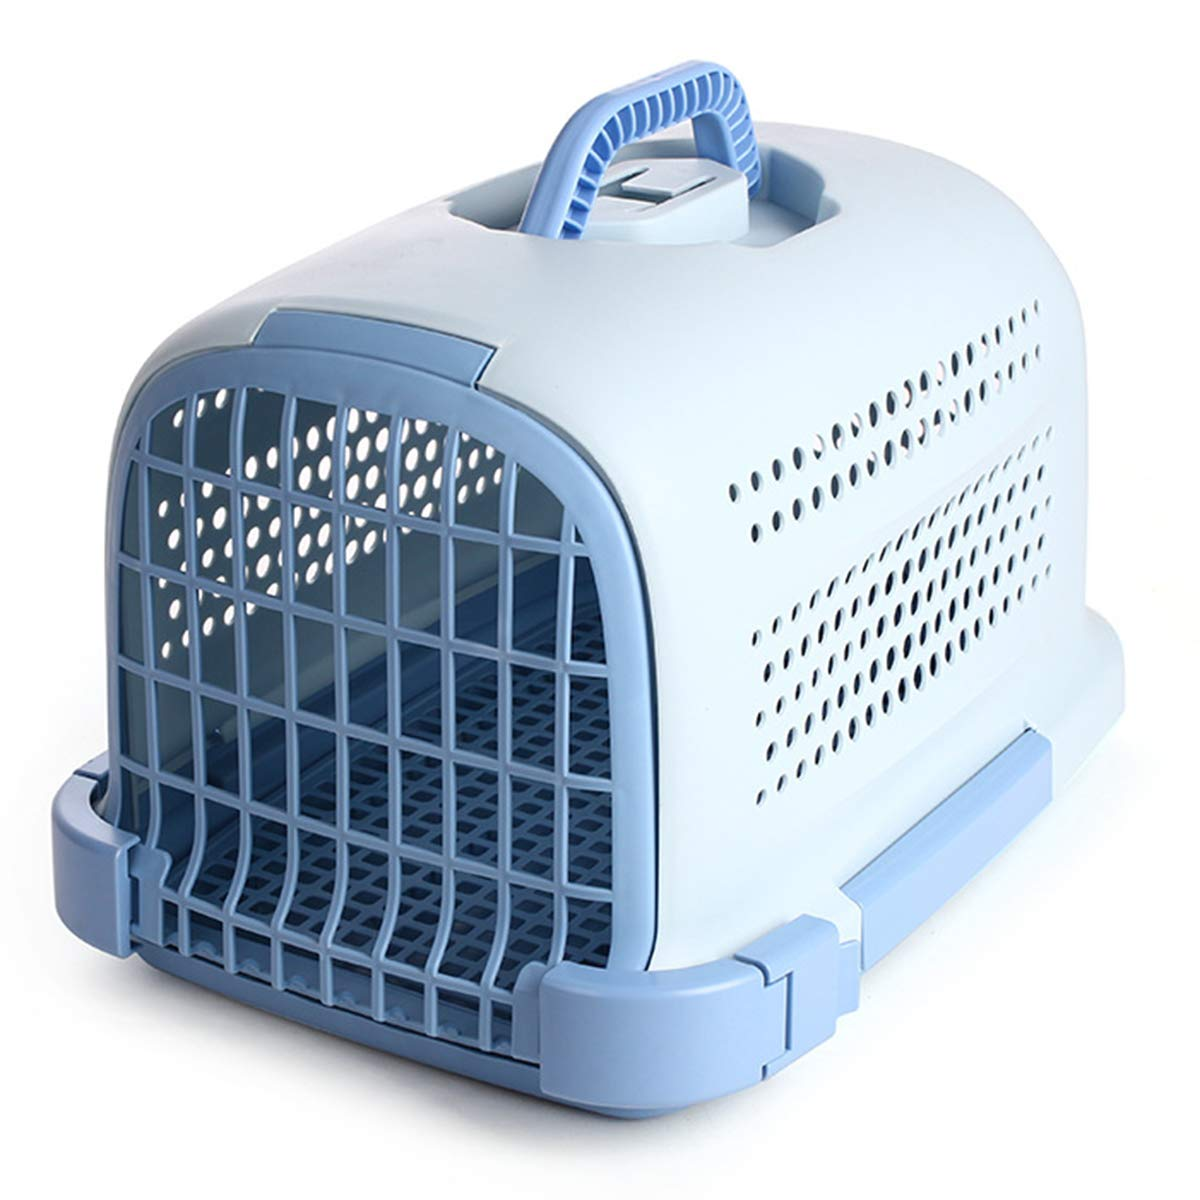 bluee 483429cmHWX Premium Plastic Pet Carrier, Kitten Cat Dog Animal Portable Transport Travel Box Cage,brown,48  34  29cm